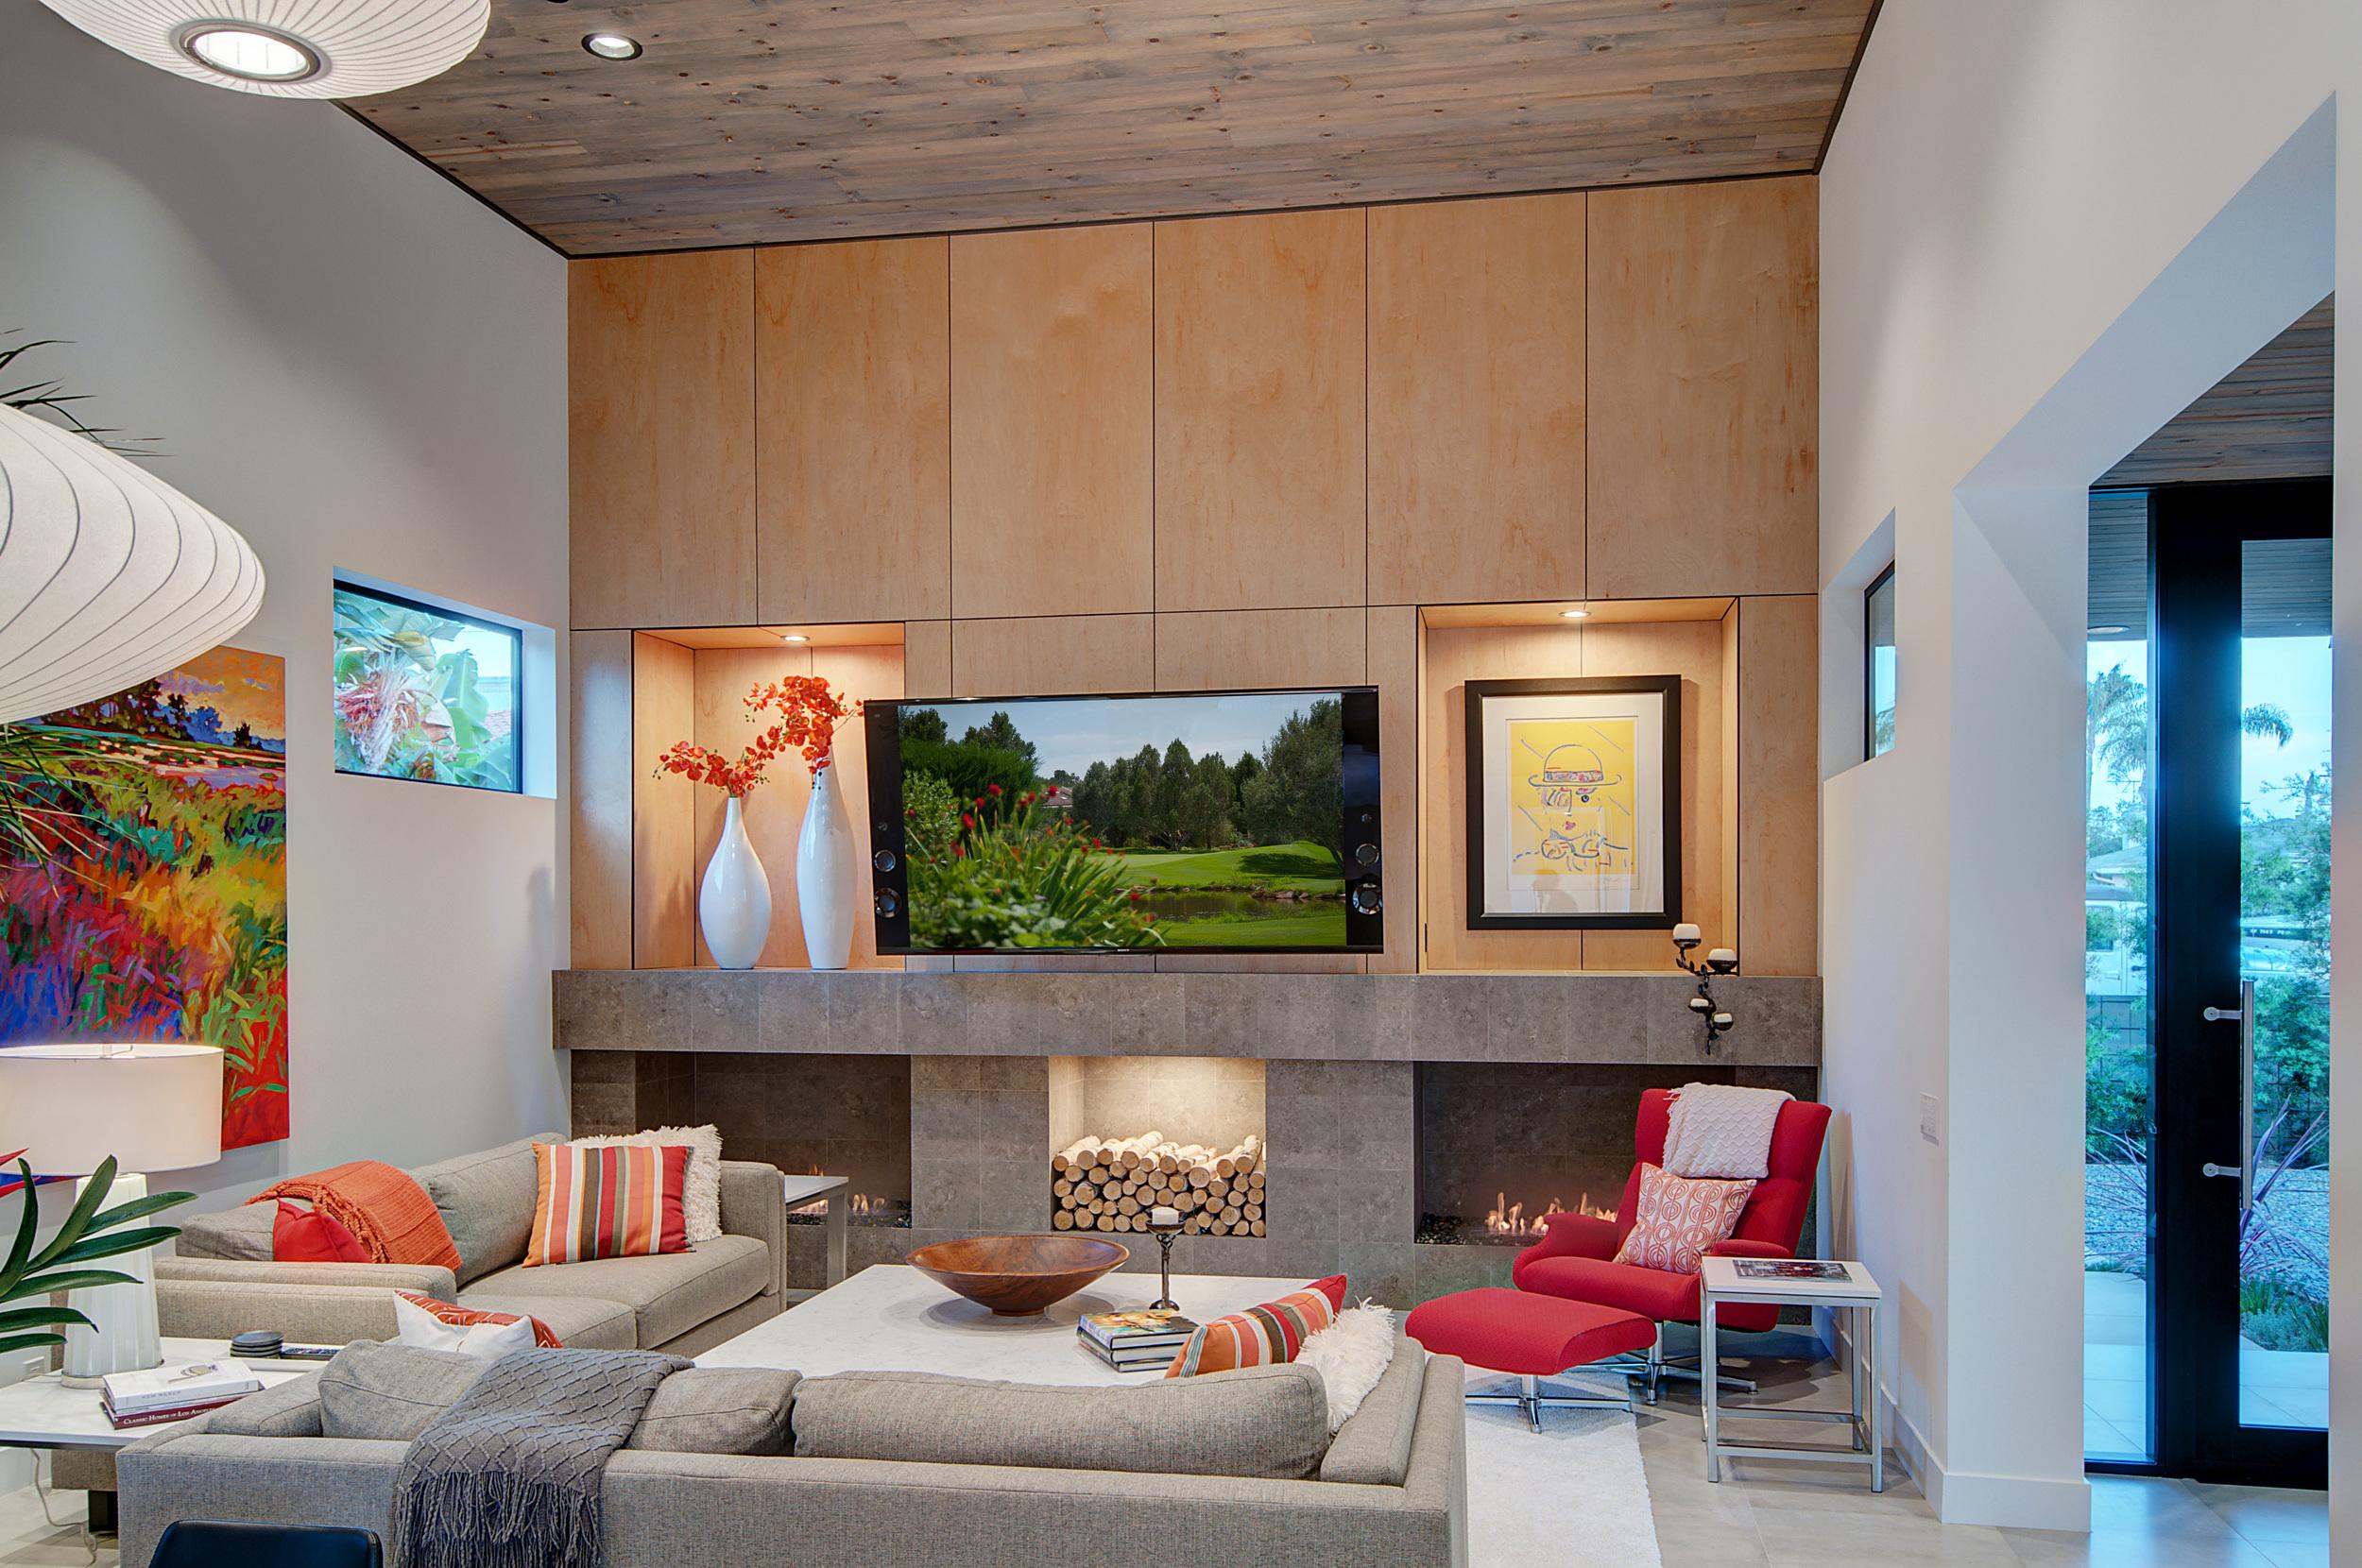 LR_Living Room-2.jpg